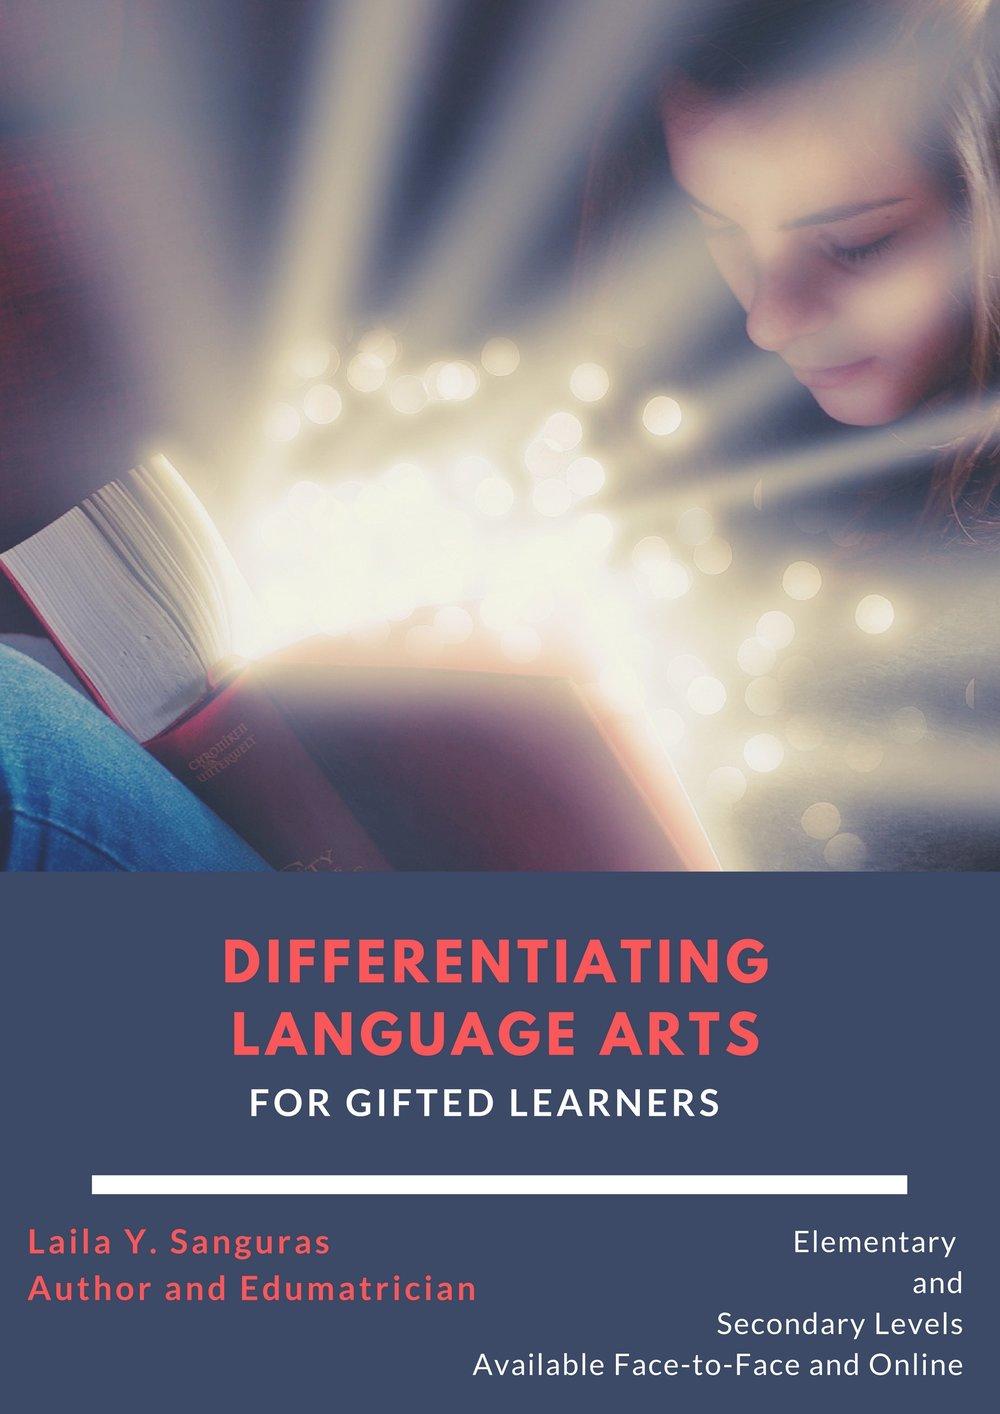 Differentiating Language Arts.jpg